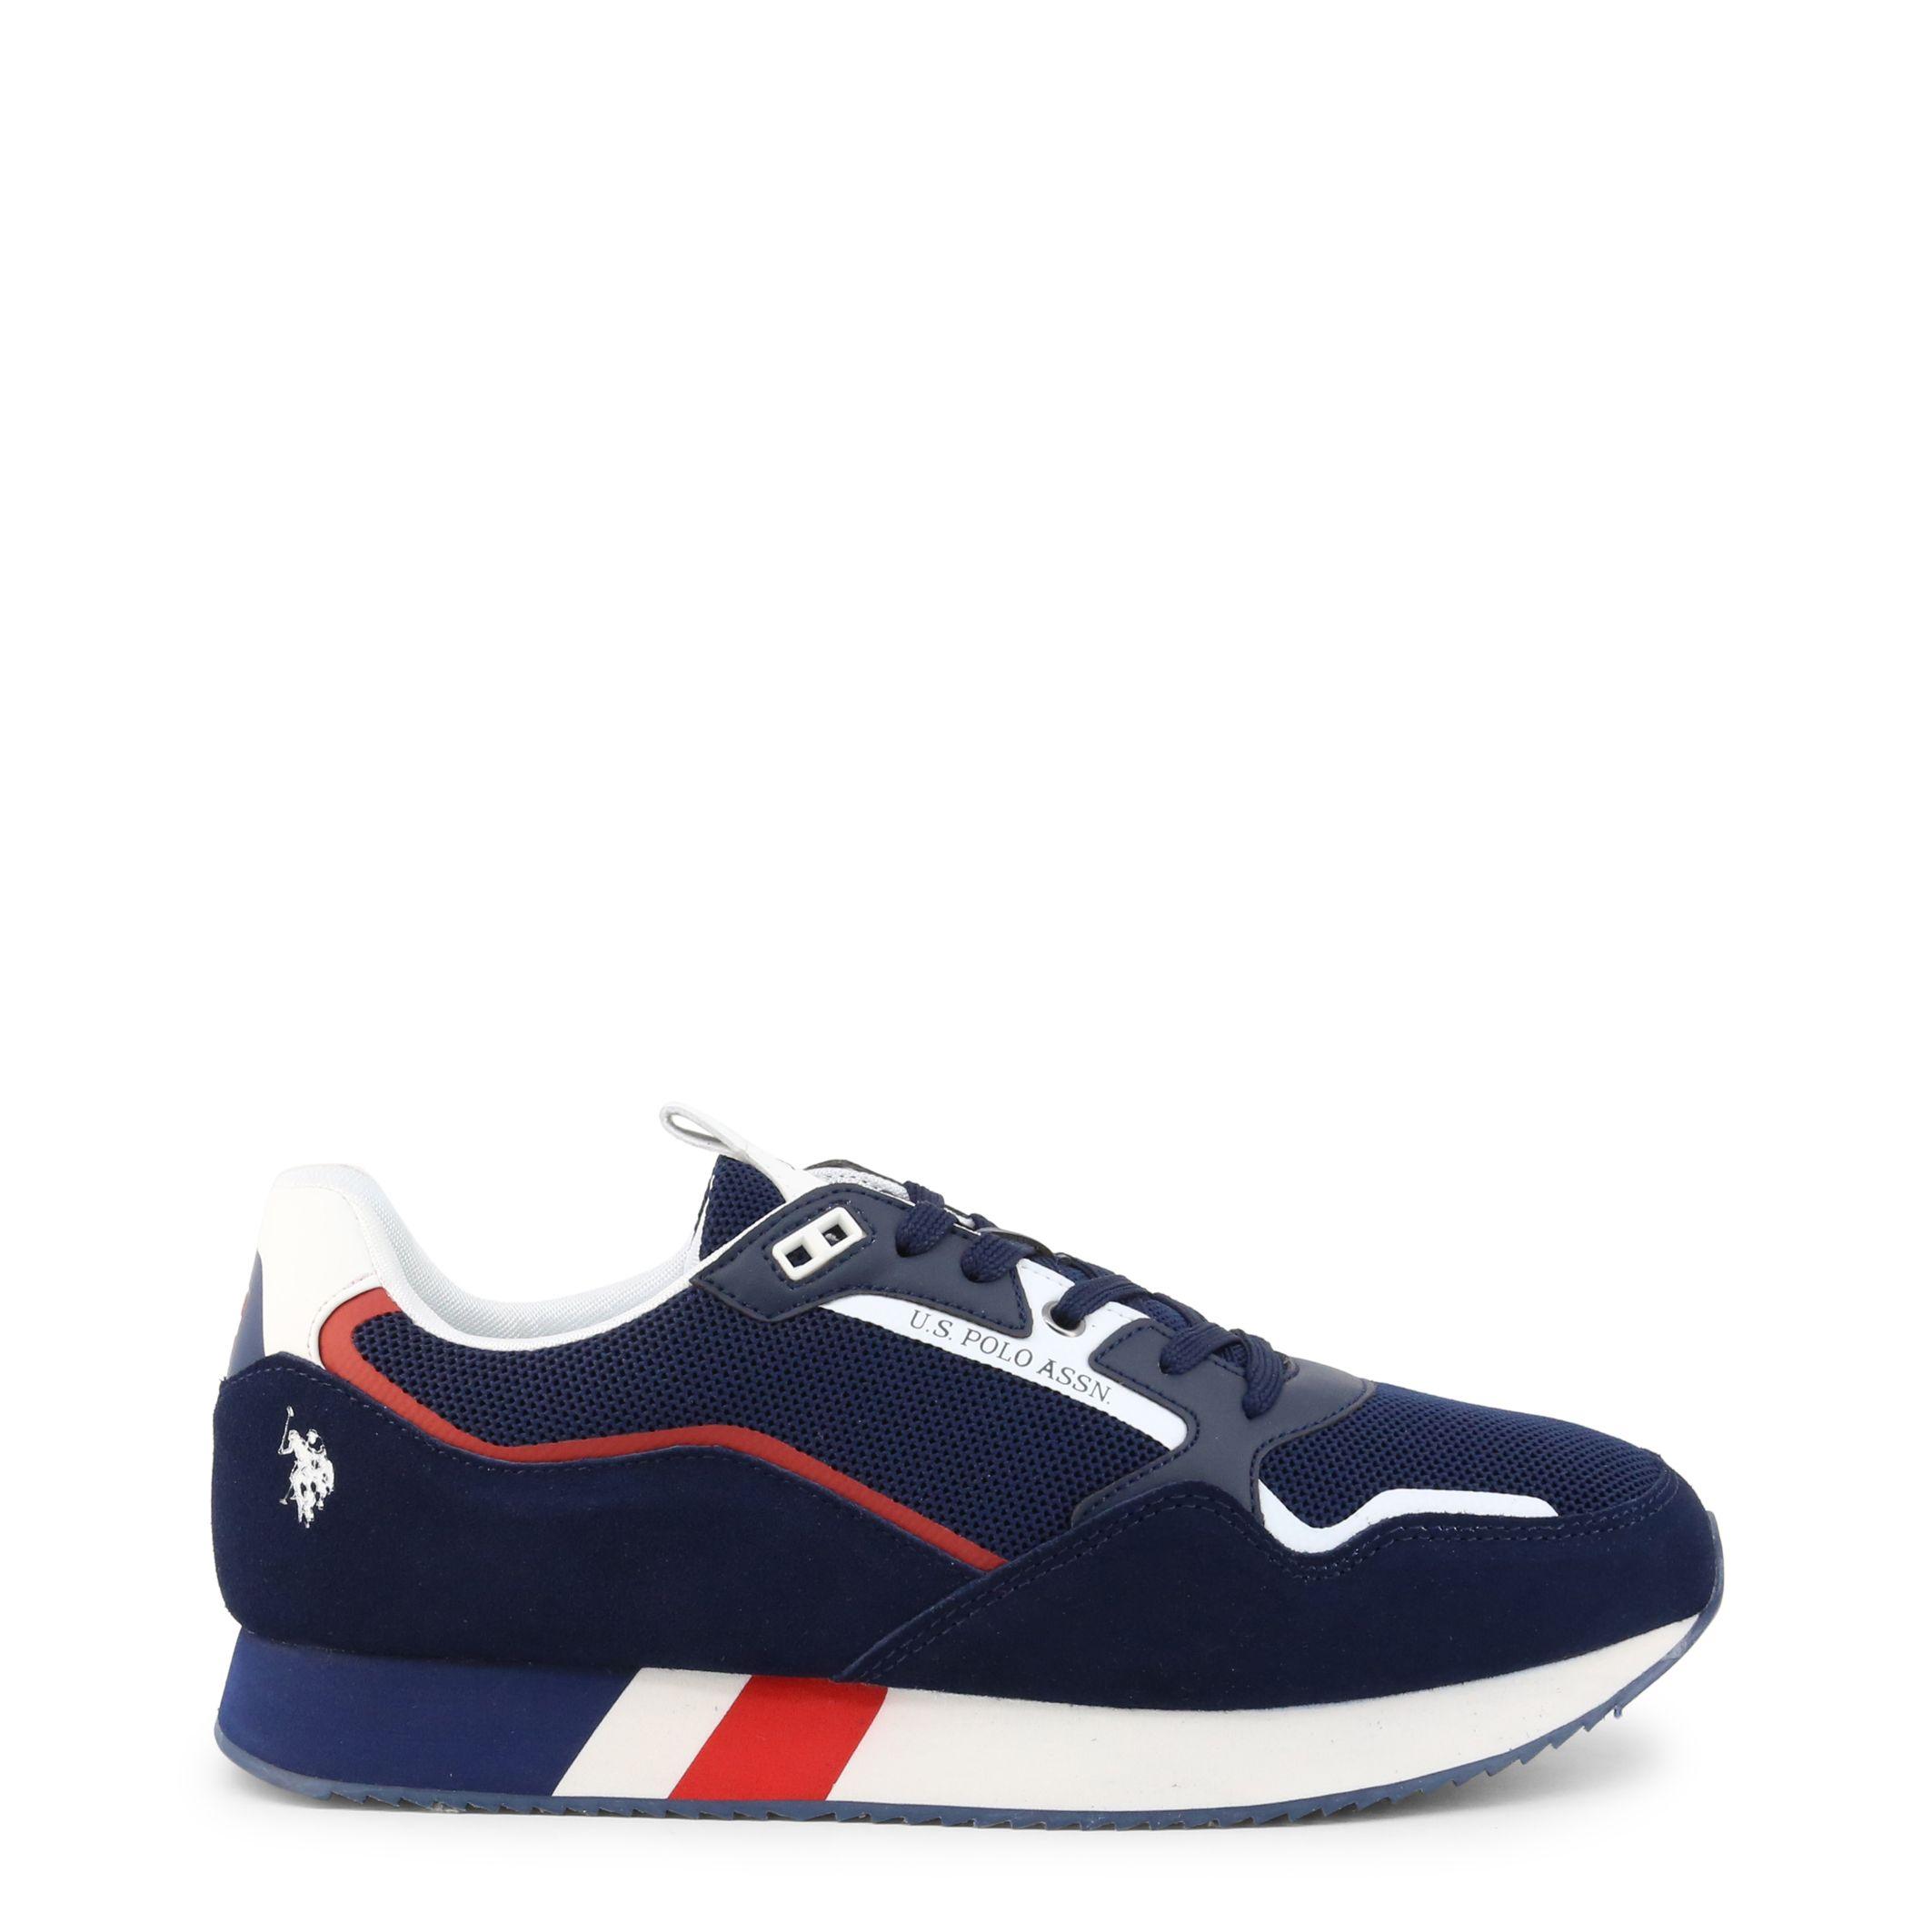 U.S. Polo Assn. – LEWIS4143S1_HM1 – Blauw Designeritems.nl